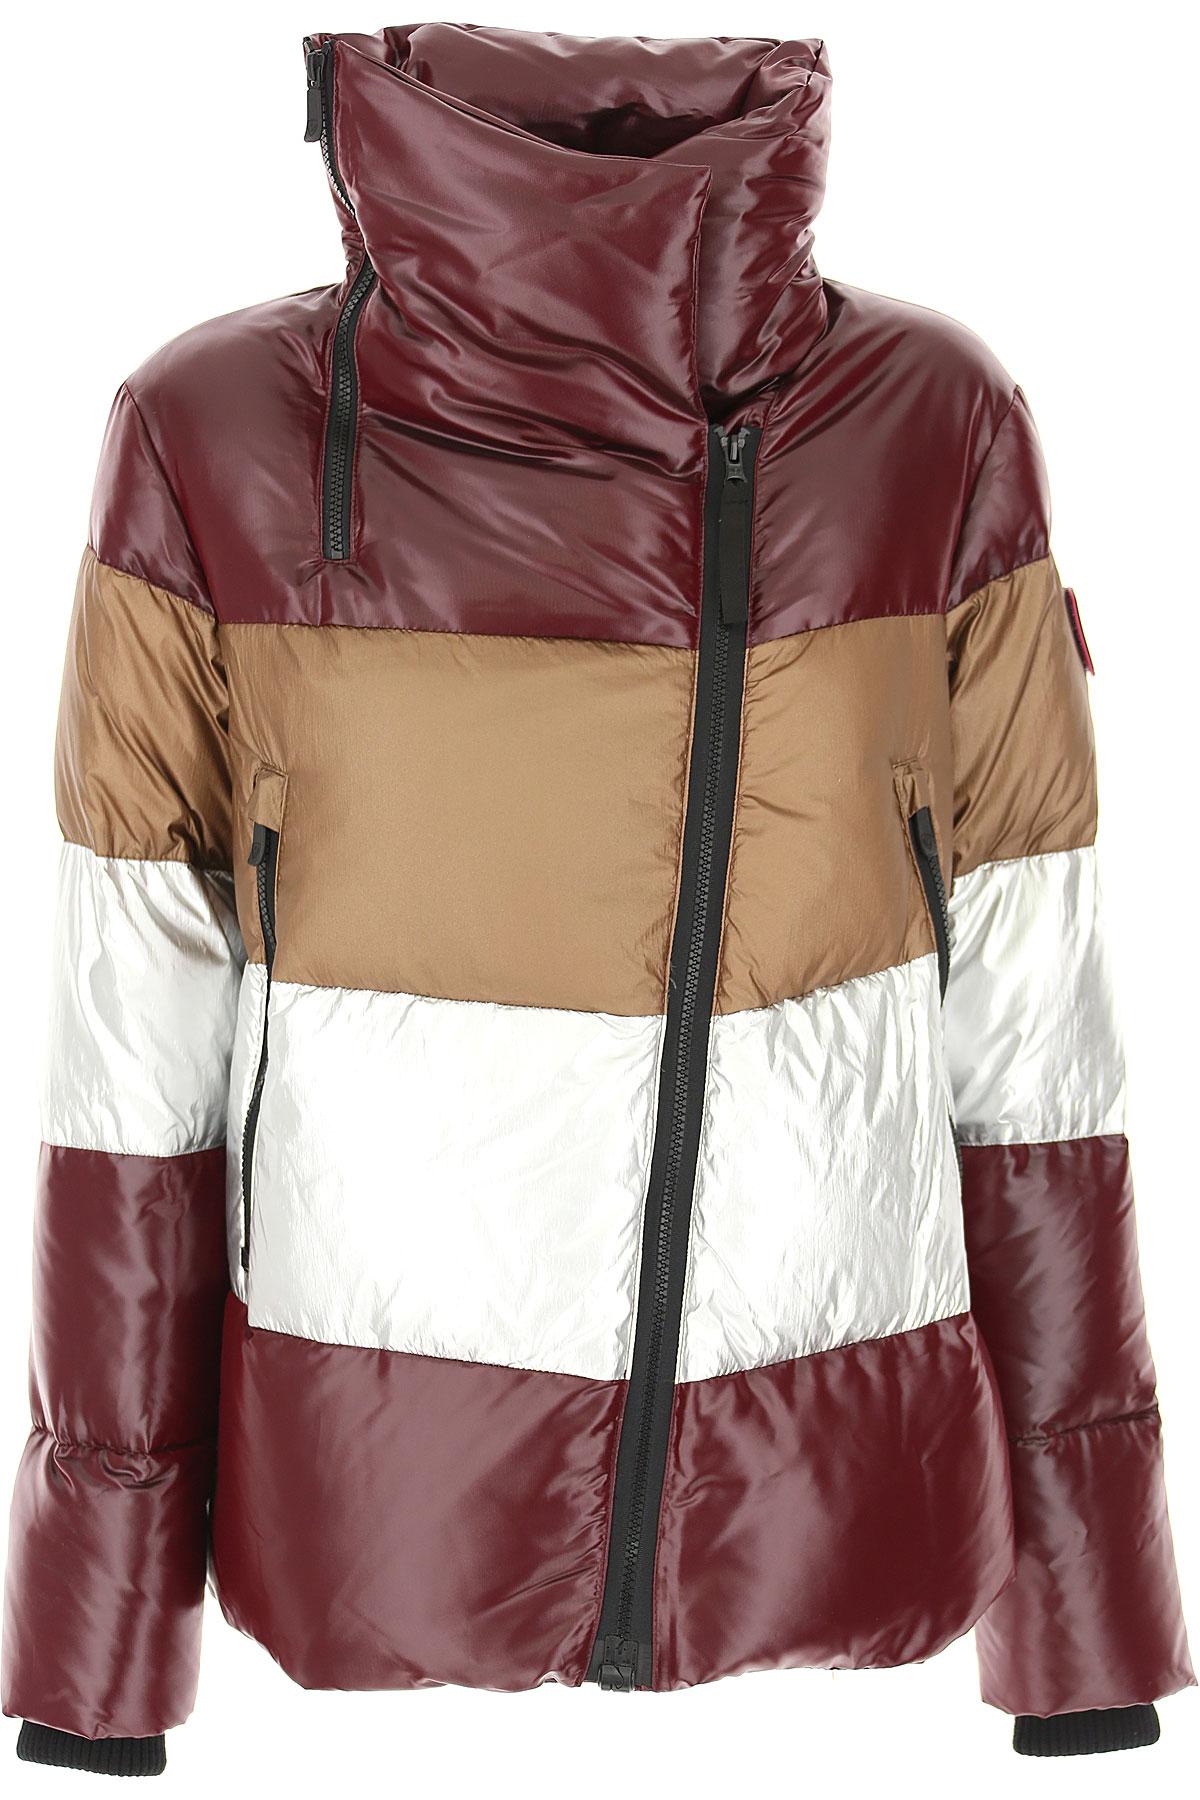 Rossignol Down Jacket for Women, Puffer Ski Jacket On Sale, Bordeaux, Down, 2019, 2 4